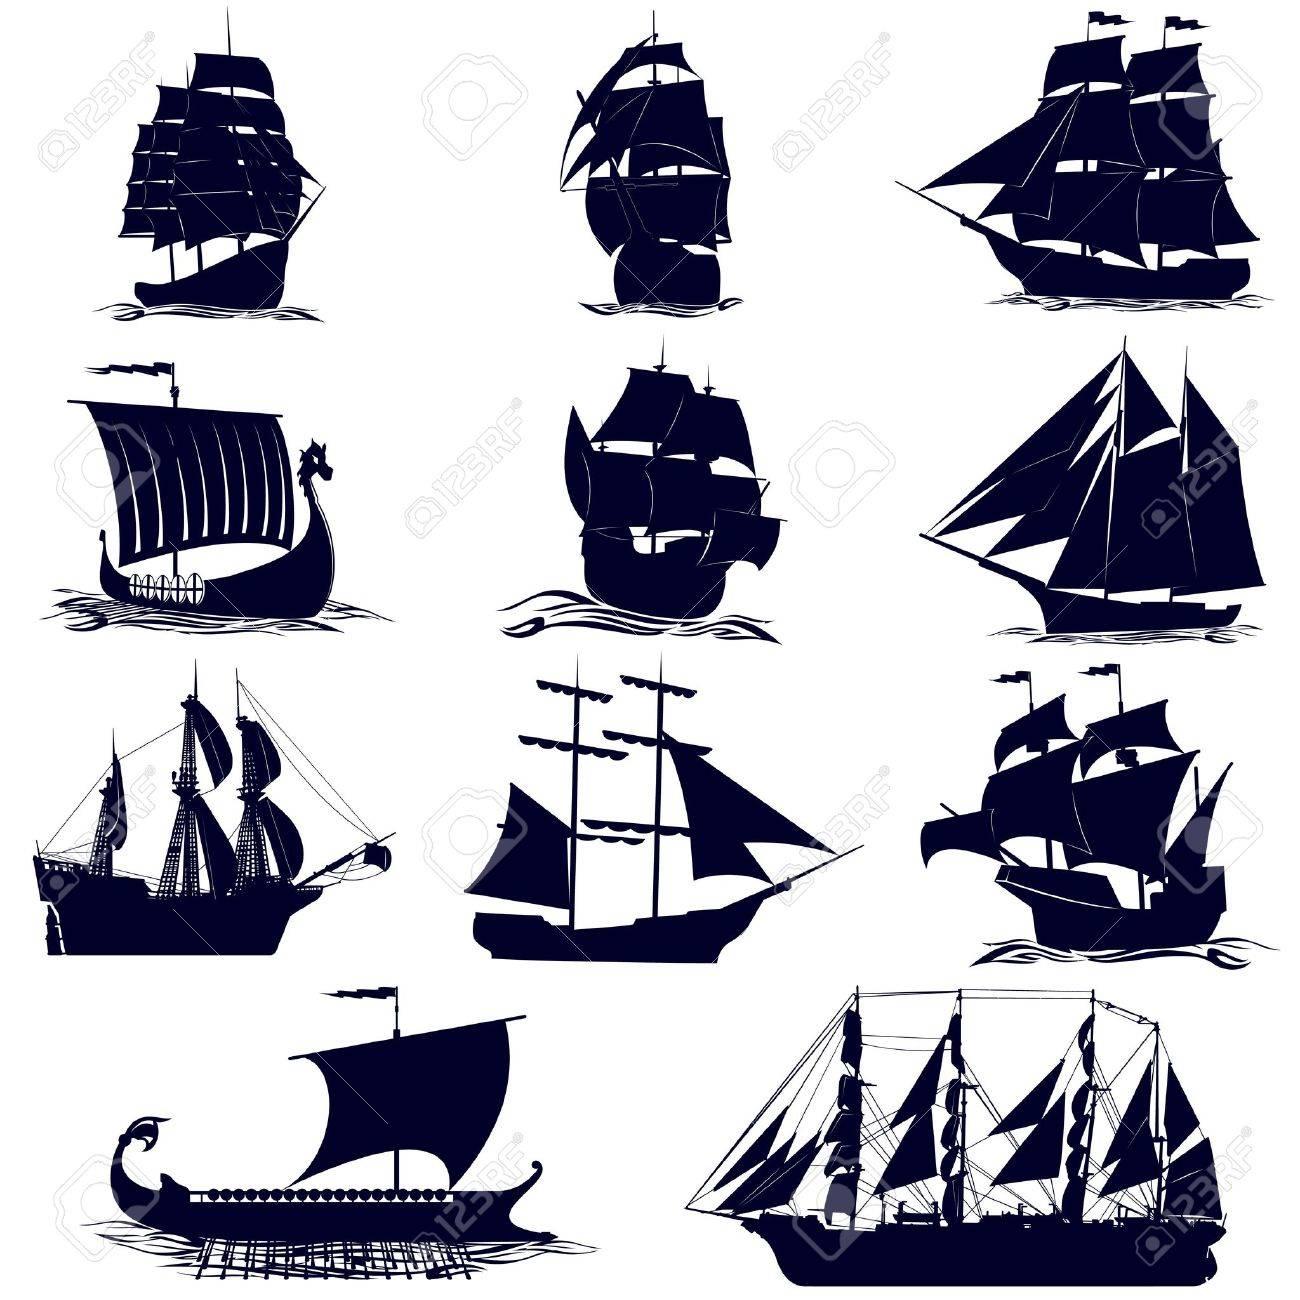 old sailing ships illustration on white background royalty free